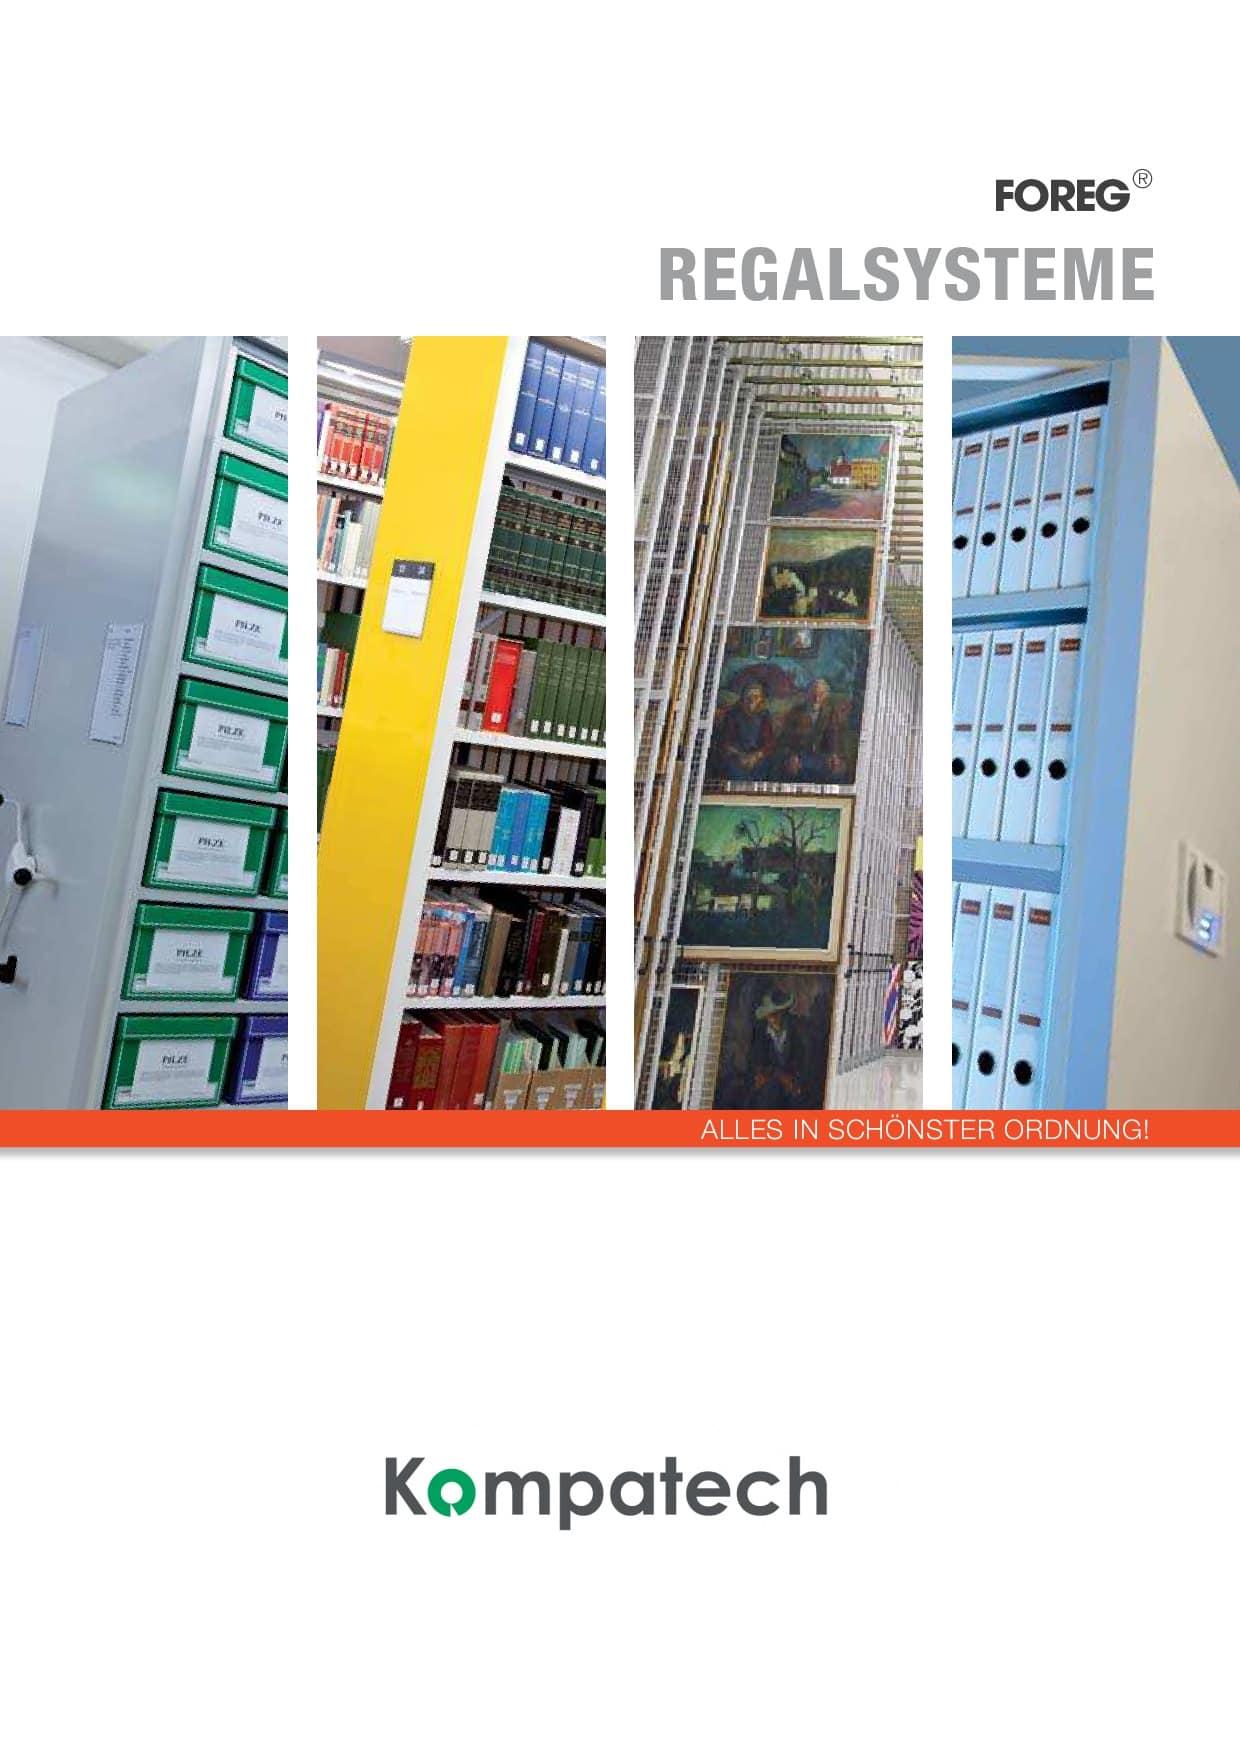 Archiv Rollregal Katalog Foreq